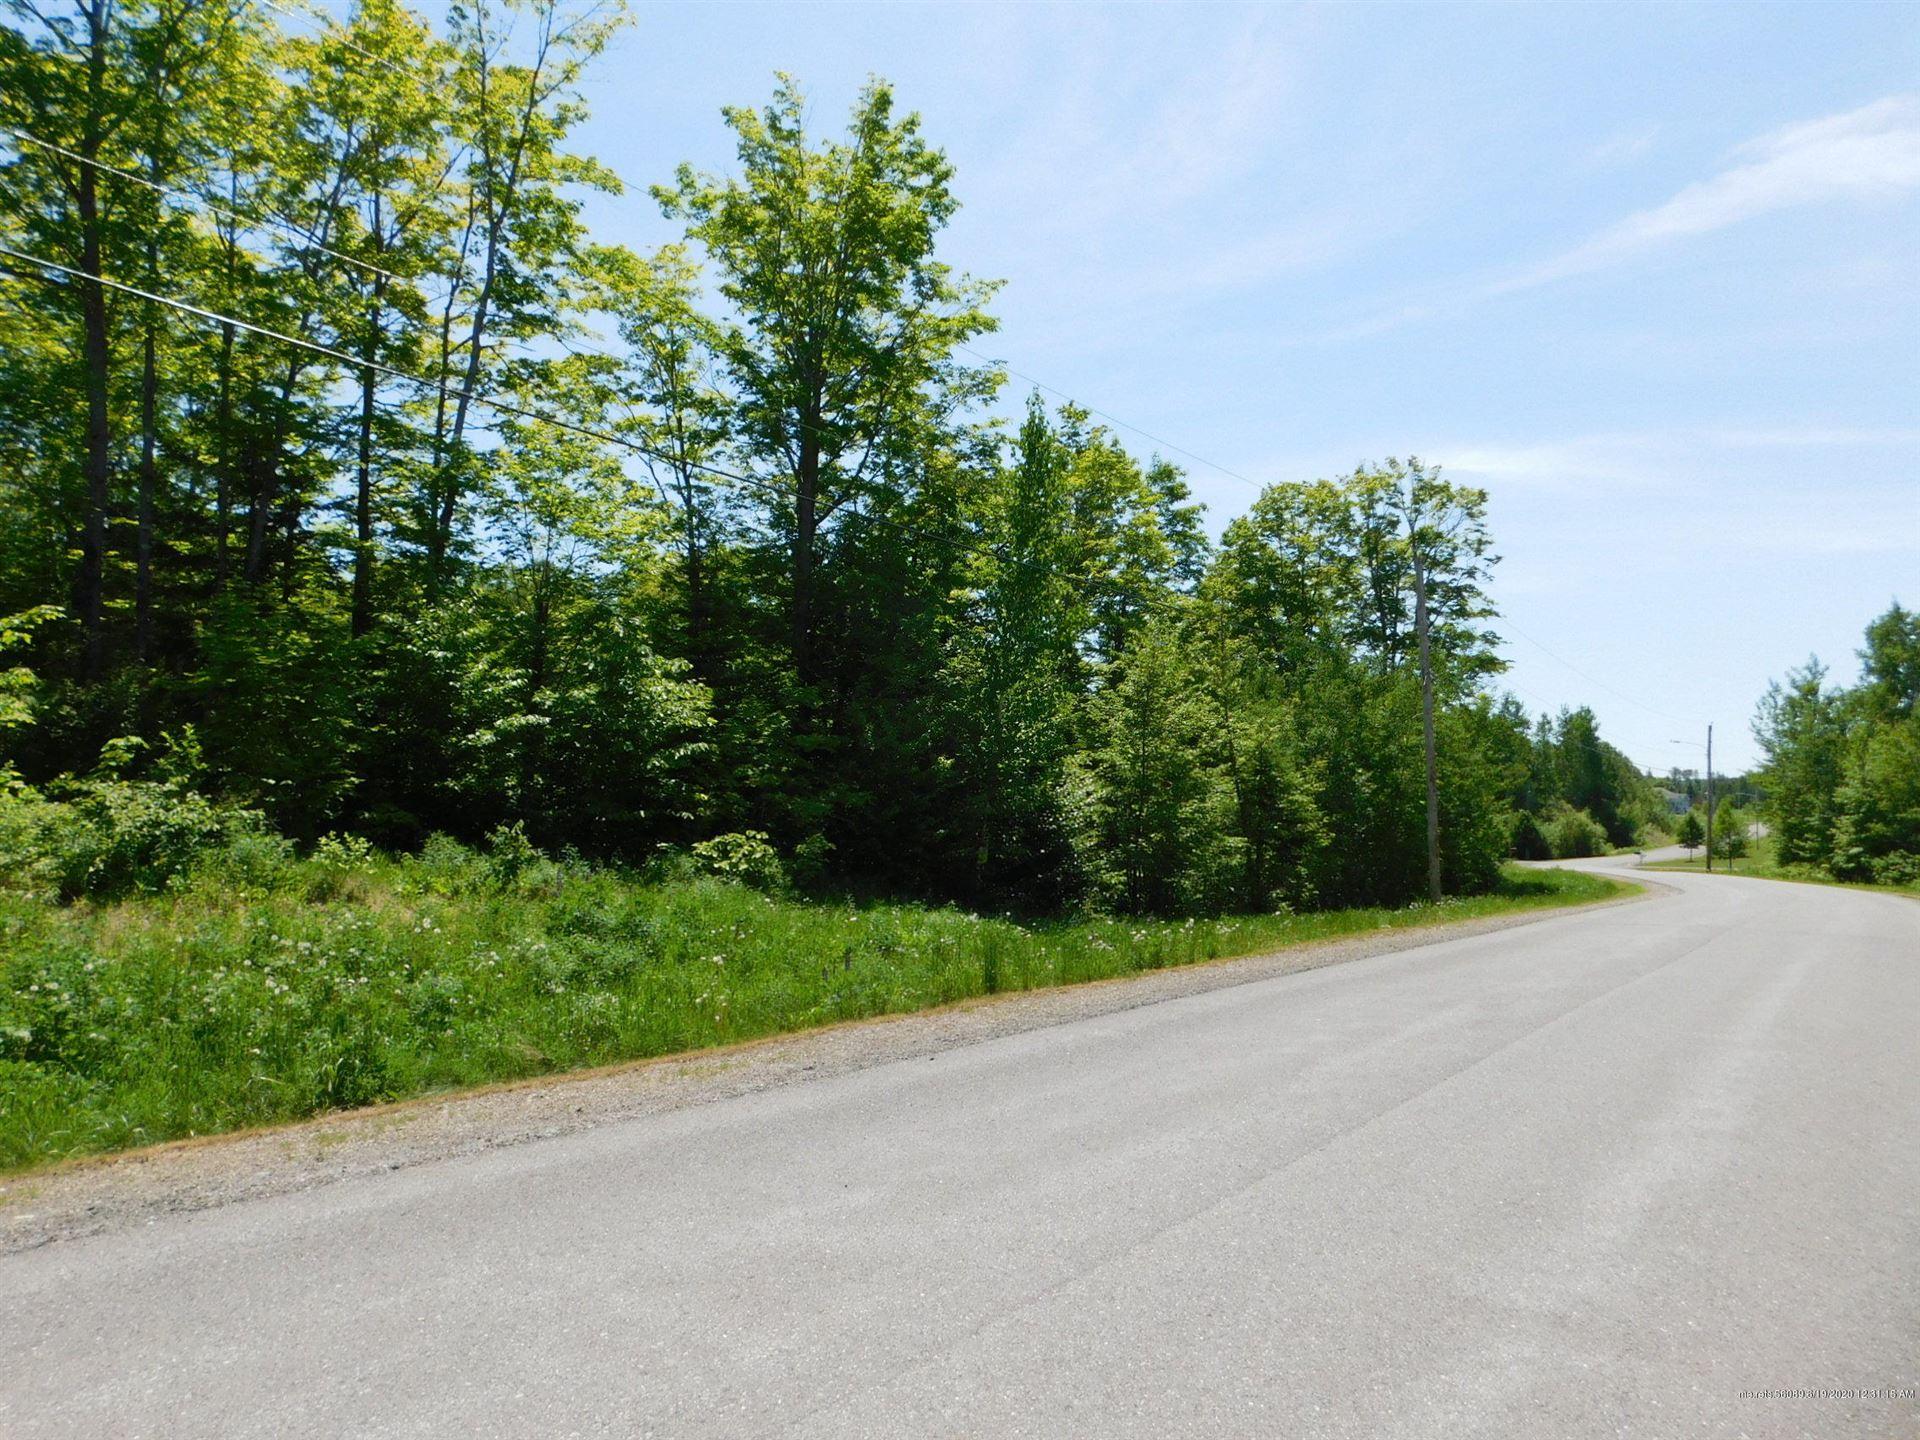 Photo of 6 Duncan Drive, Easton, ME 04740 (MLS # 1439403)